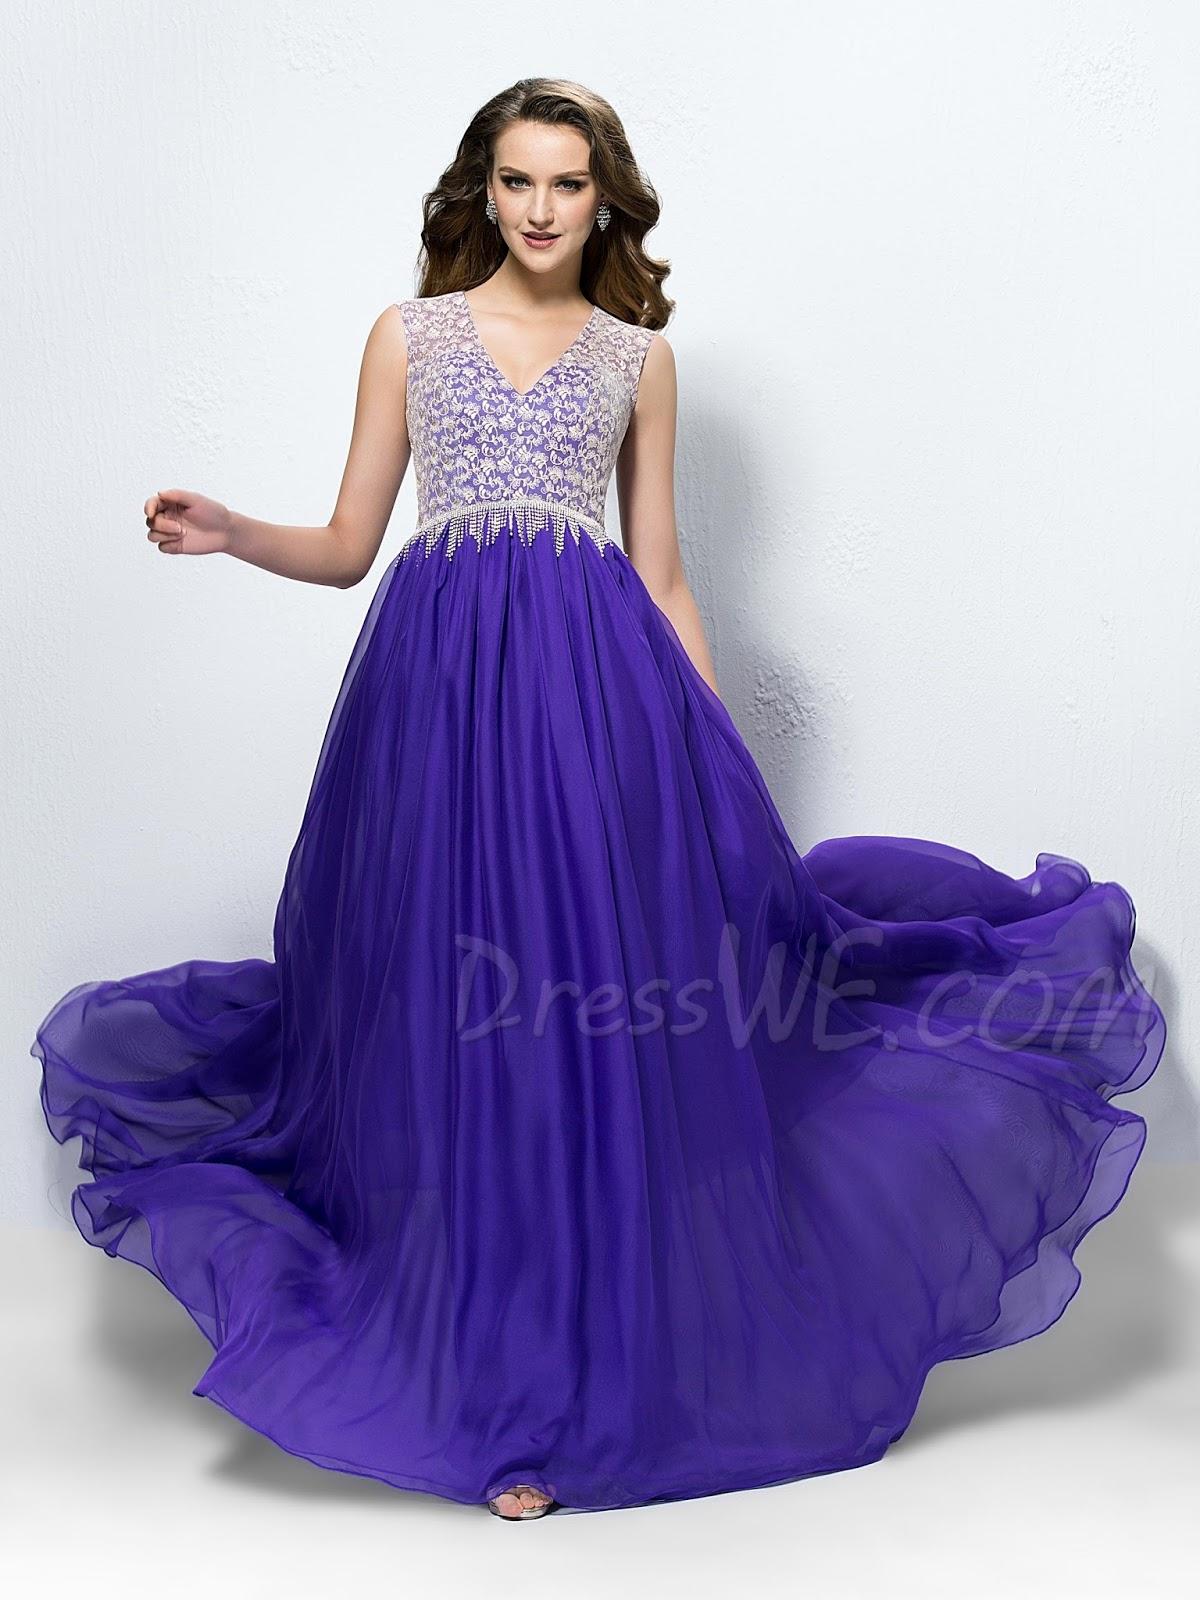 http://www.dresswe.com/item/10880938.html